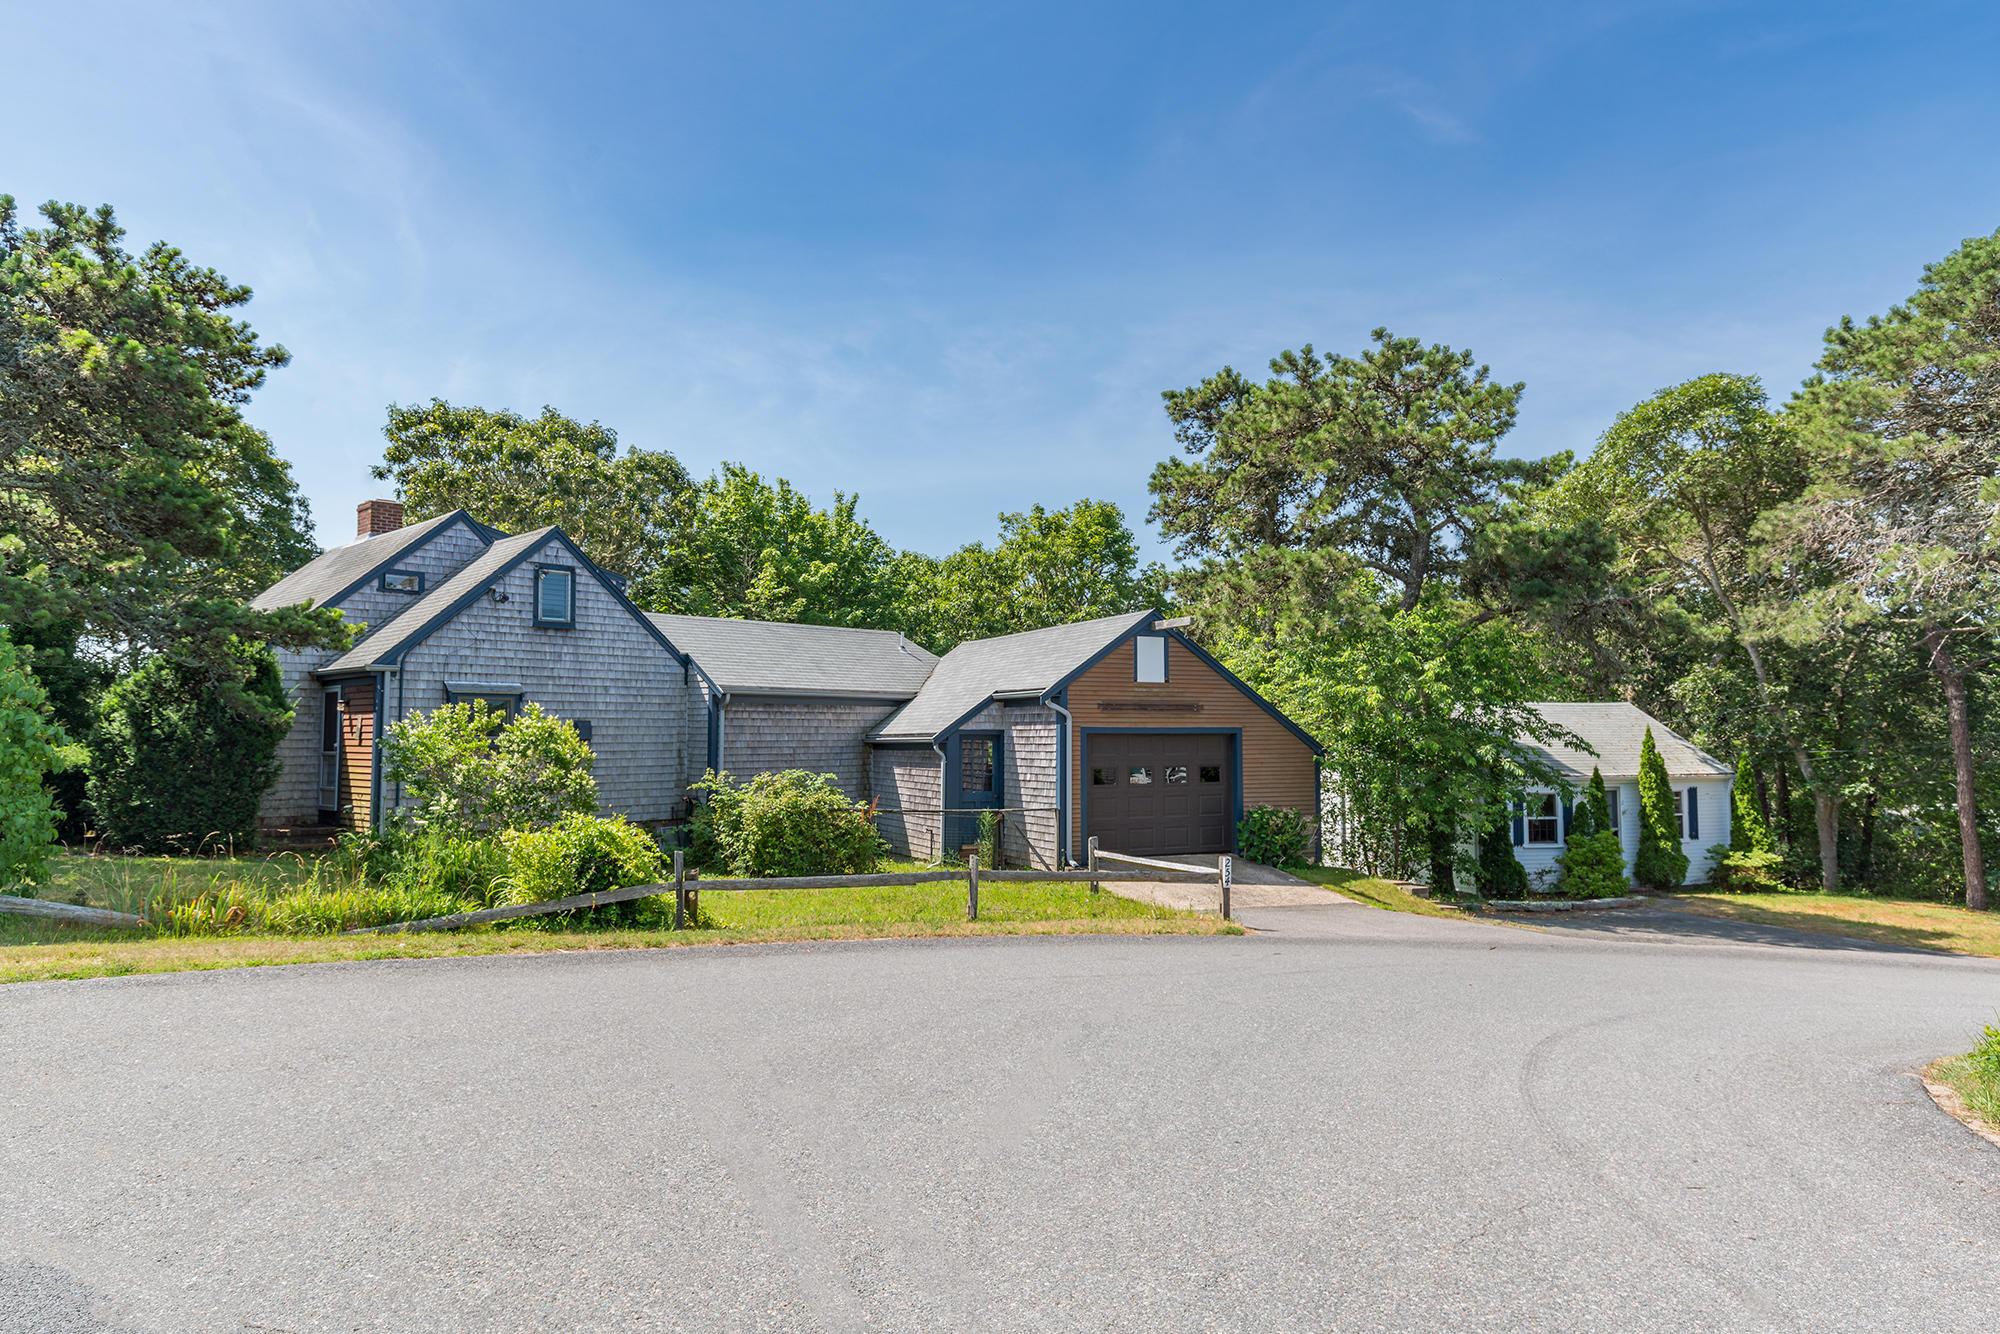 254 Ridgevale Road, Chatham MA, 02633